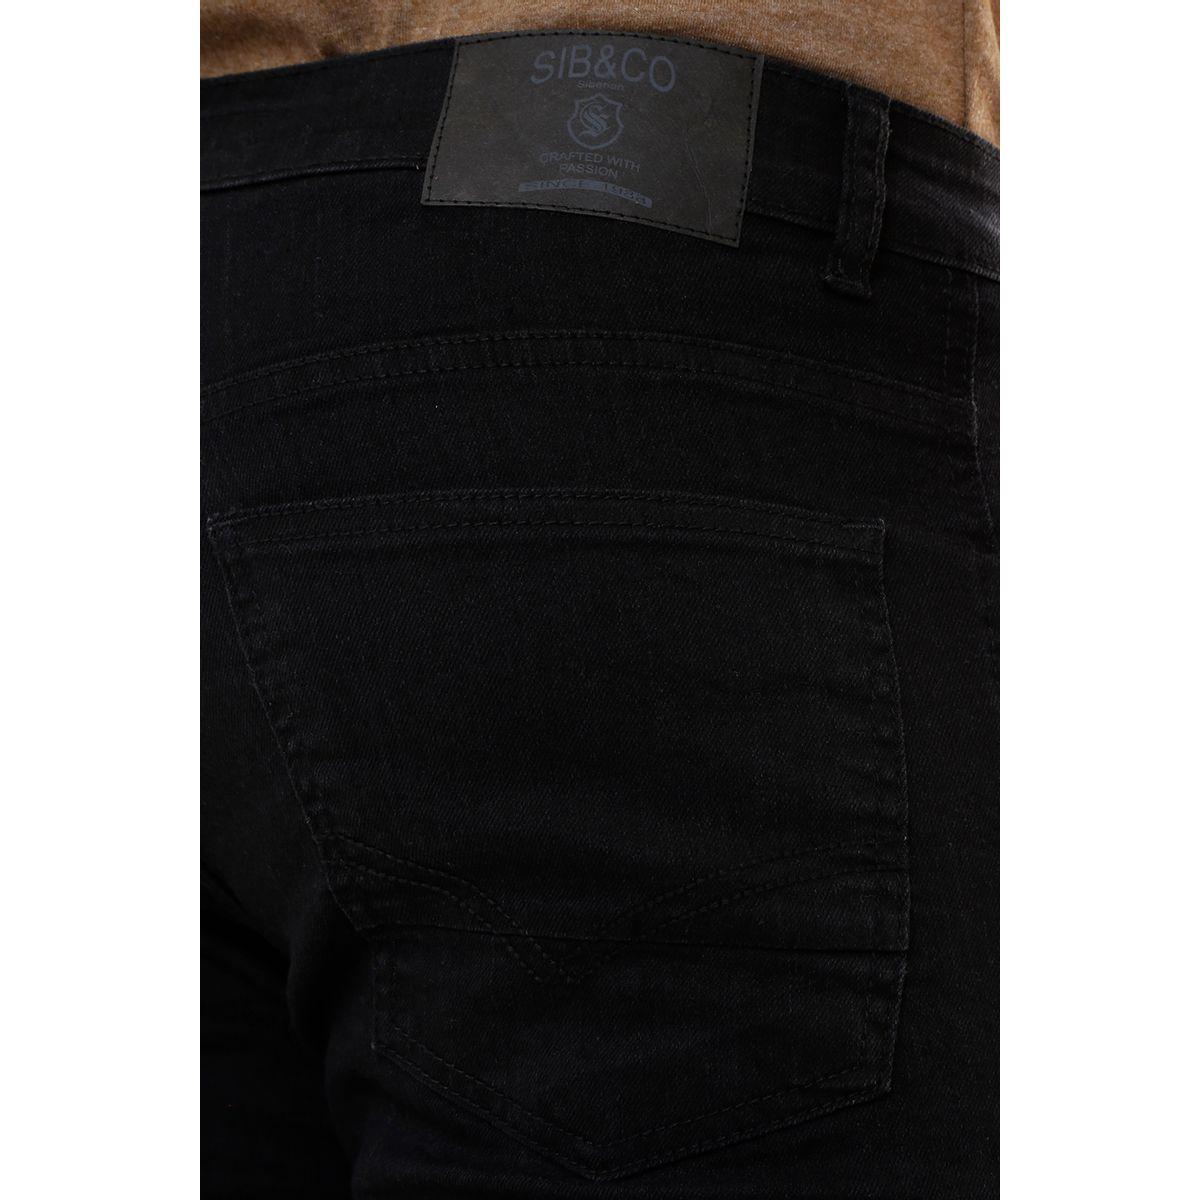 Calca-5-Pockets-Preto---40